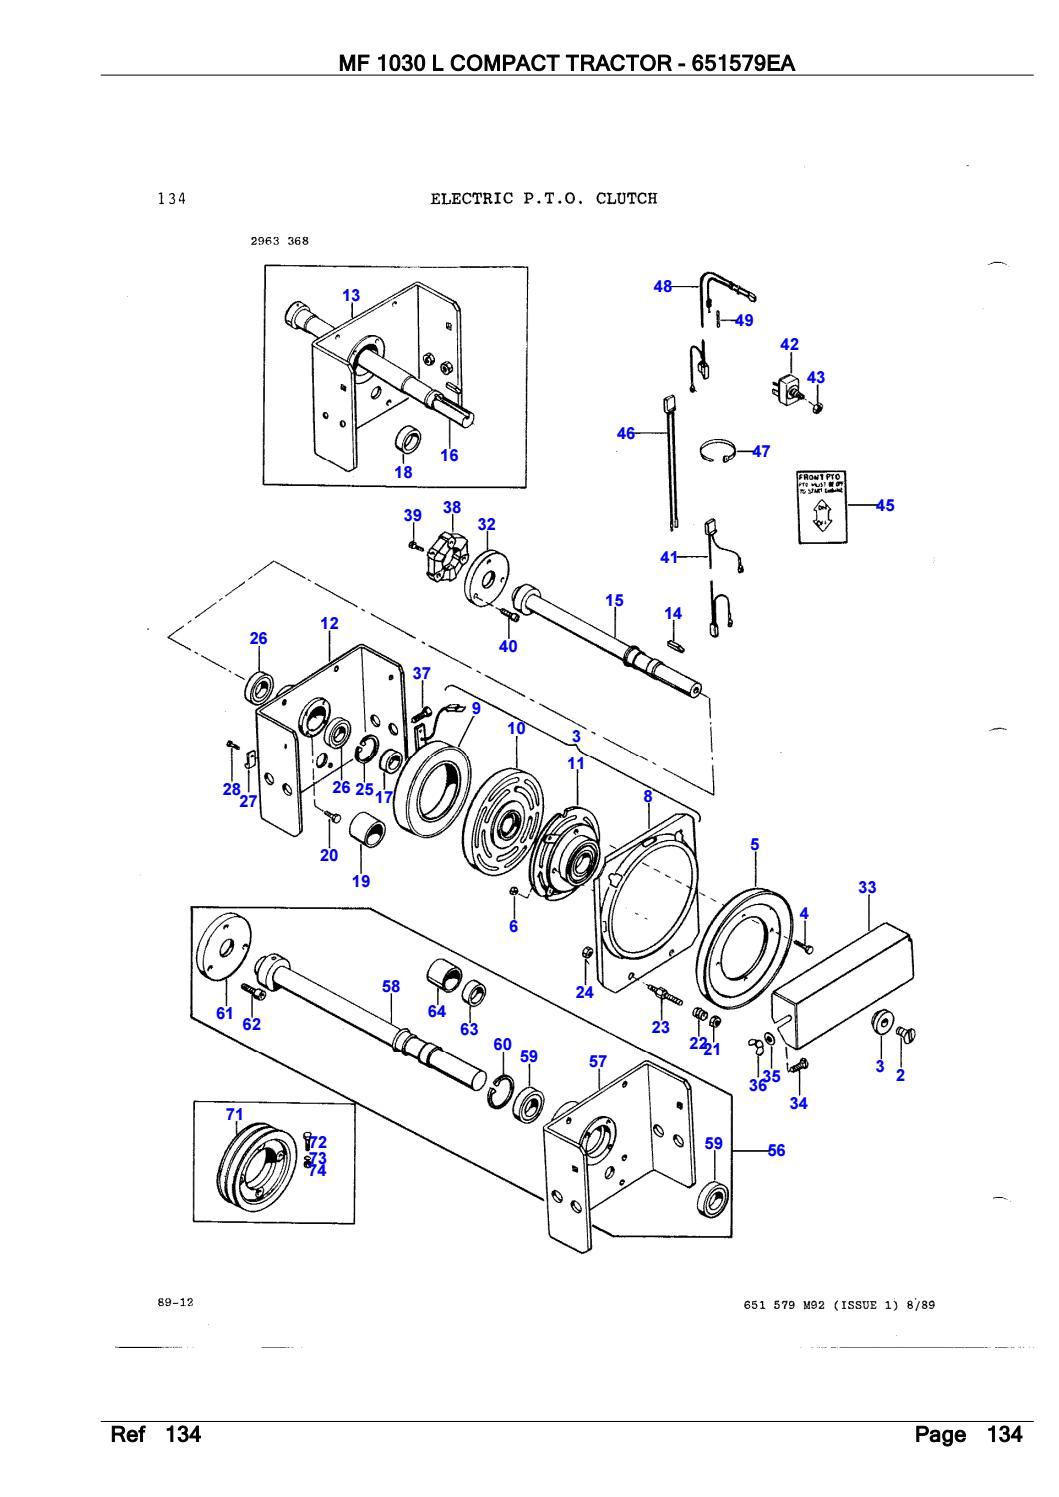 Massey Ferguson MF 1030 L COMPACT TRACTOR Parts Catalogue